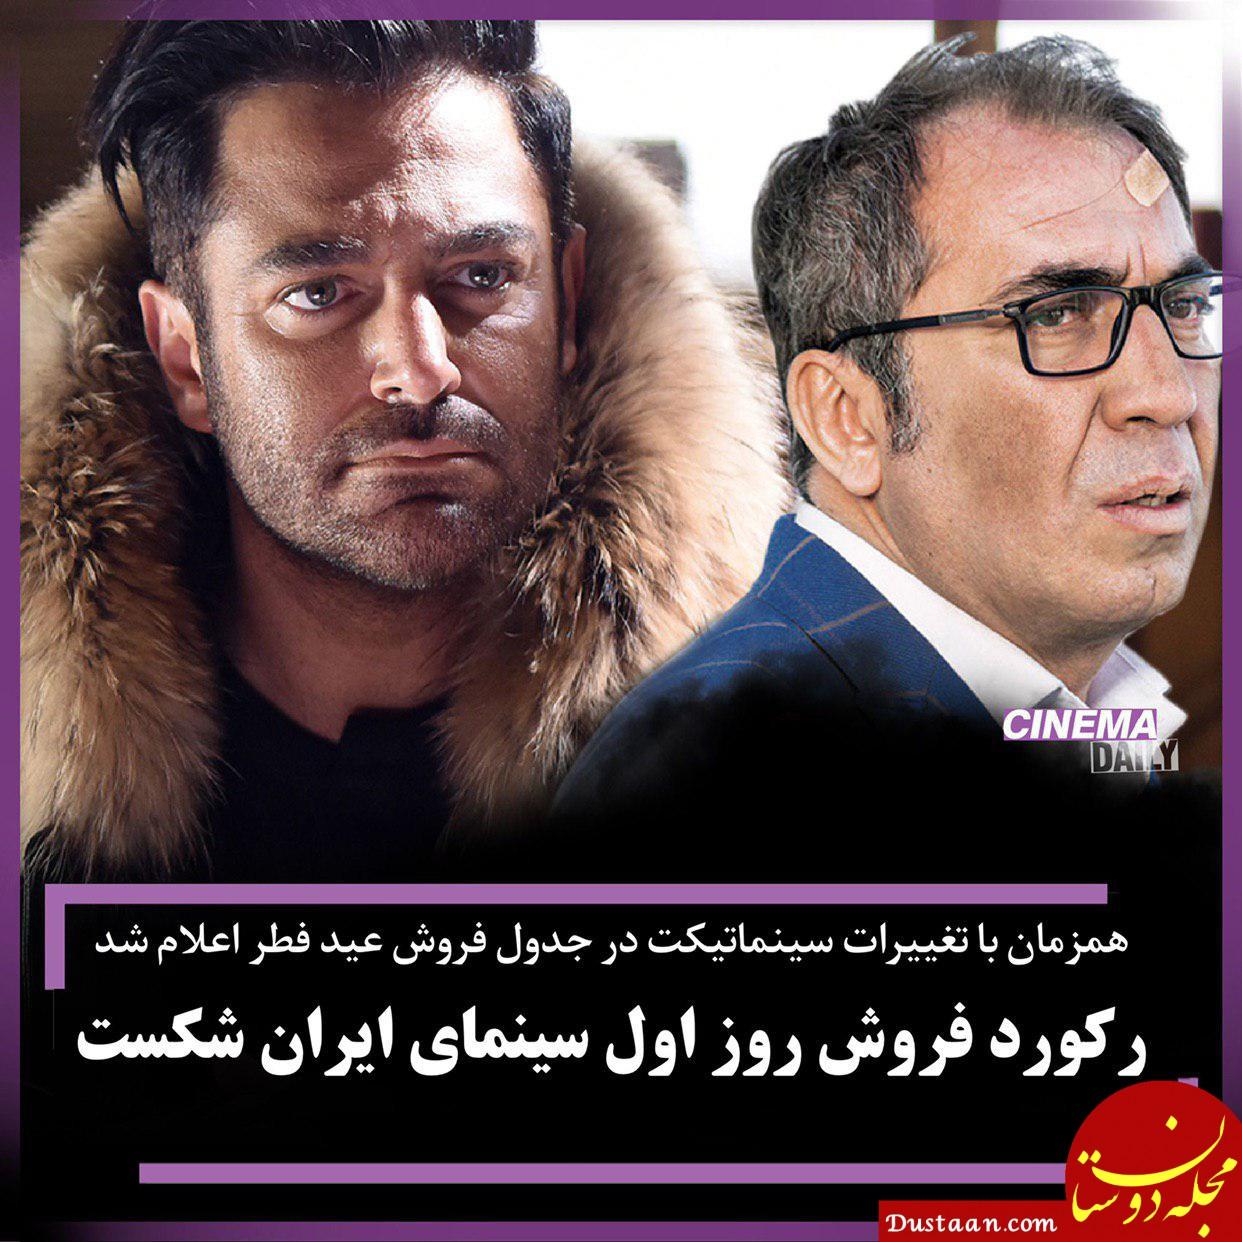 www.dustaan.com رکورد فروش روز اول سینمای ایران شکست